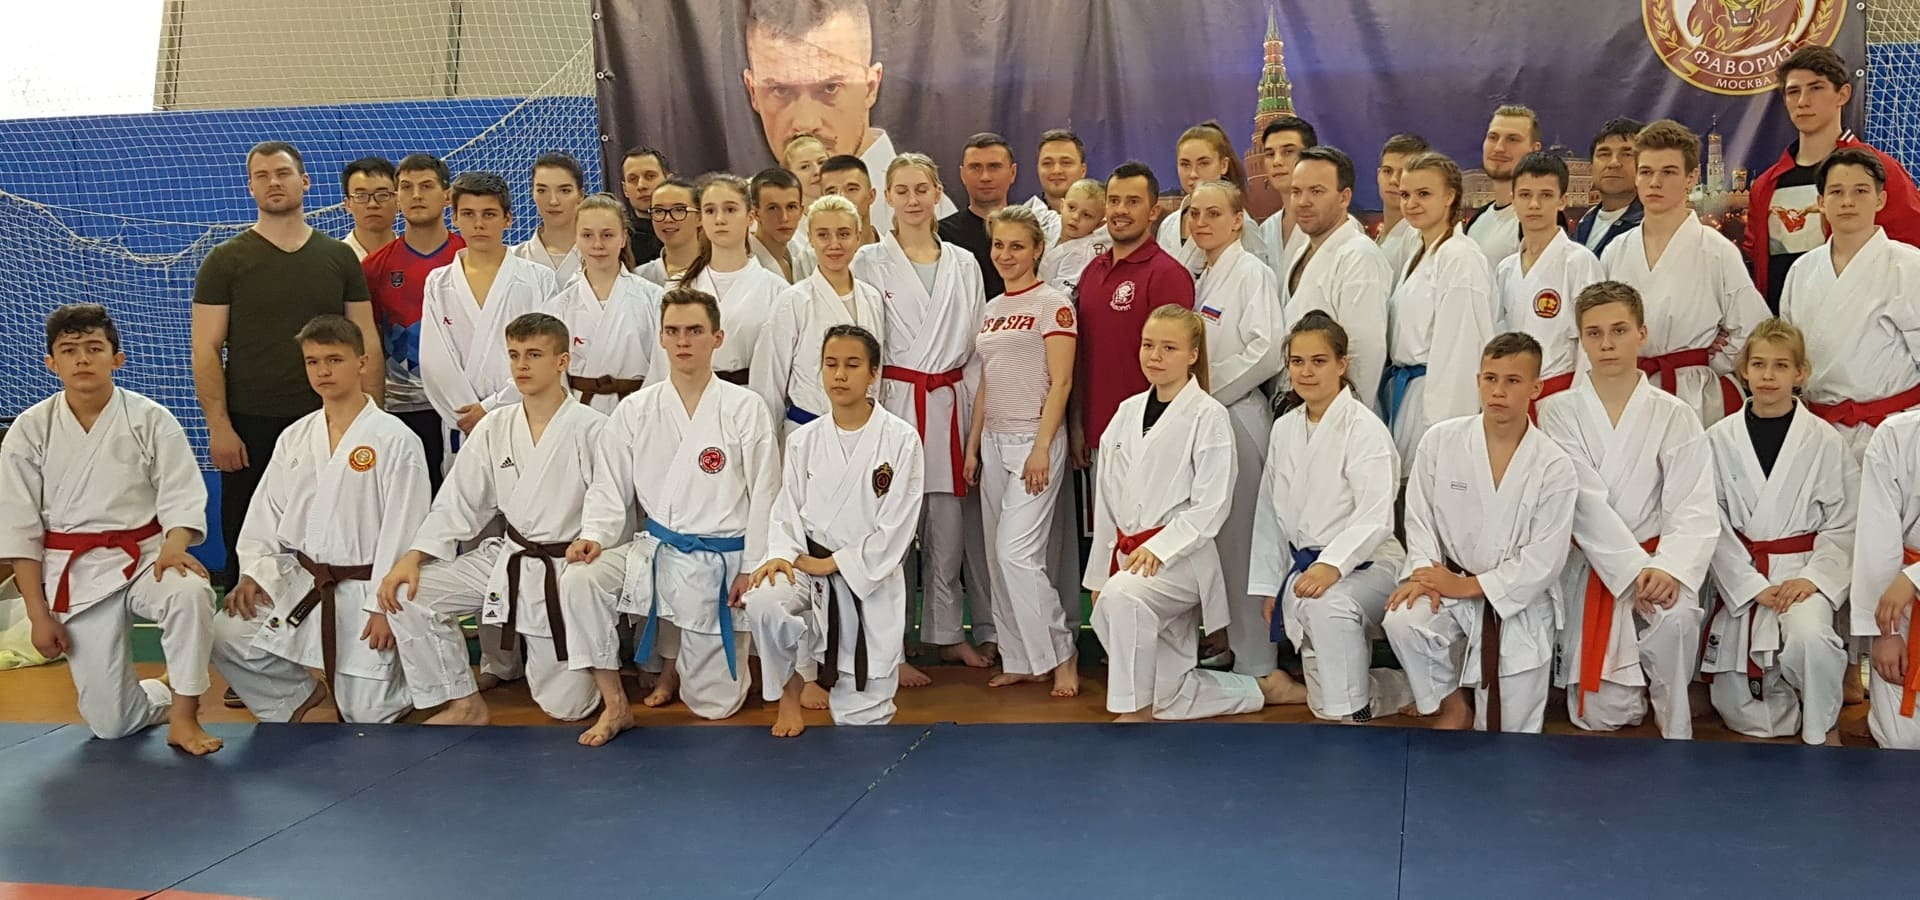 Семинар под руководством тренера мирового класса Максима Иванчикова